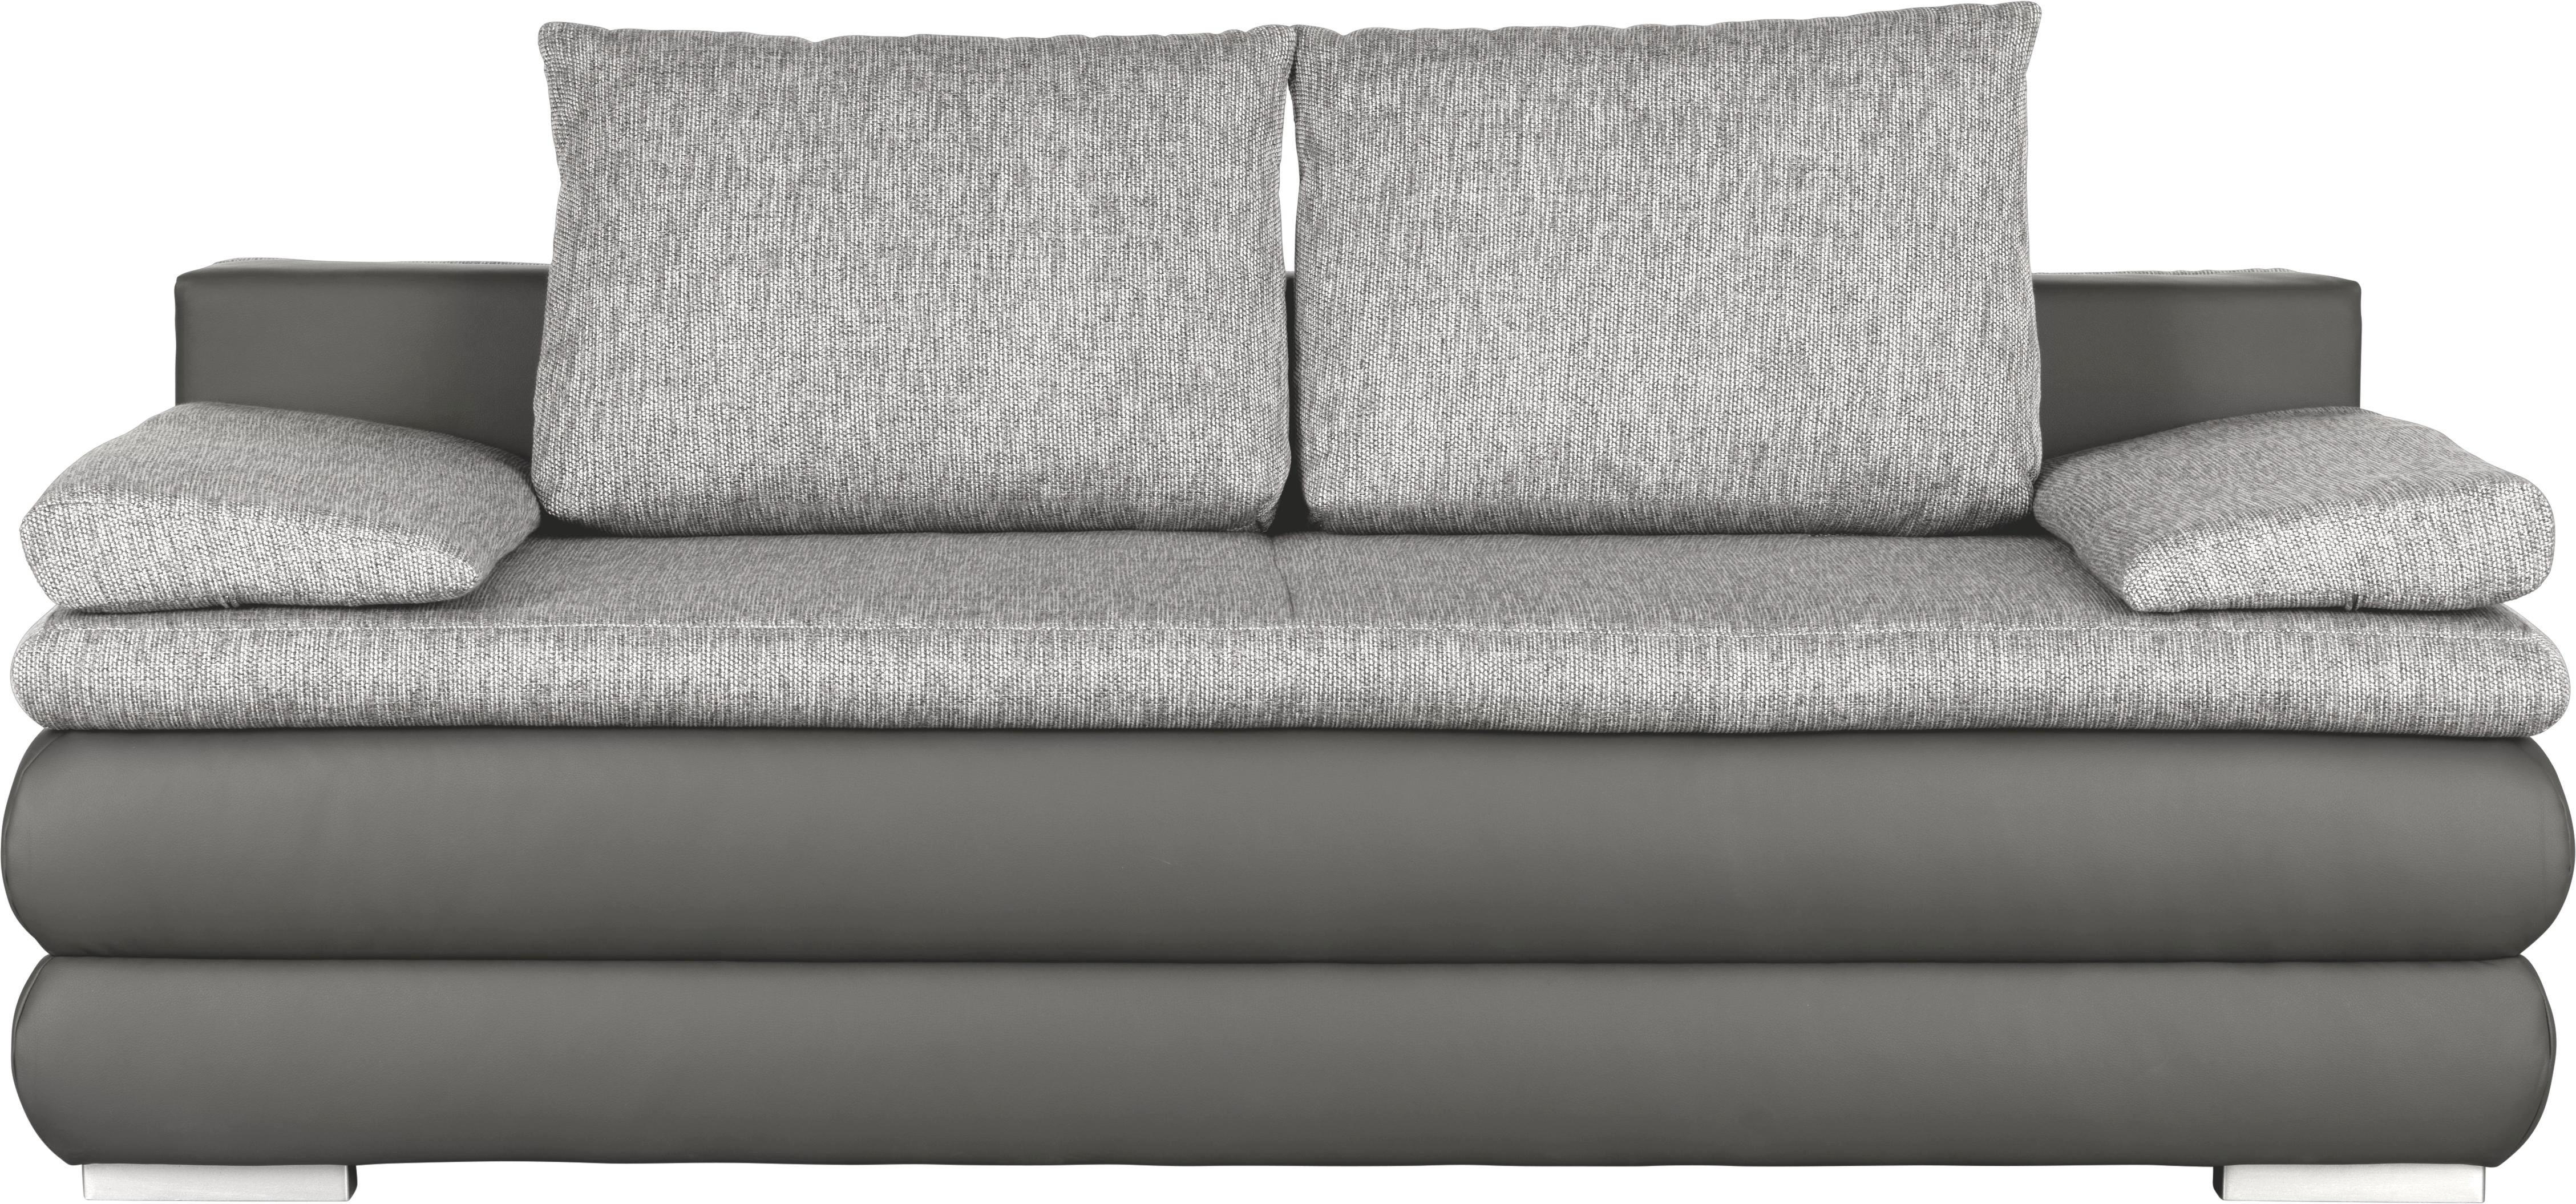 BOXSPRINGSOFA Lederlook Grau - Silberfarben/Grau, KONVENTIONELL, Holz/Textil (210/90/110cm) - VENDA